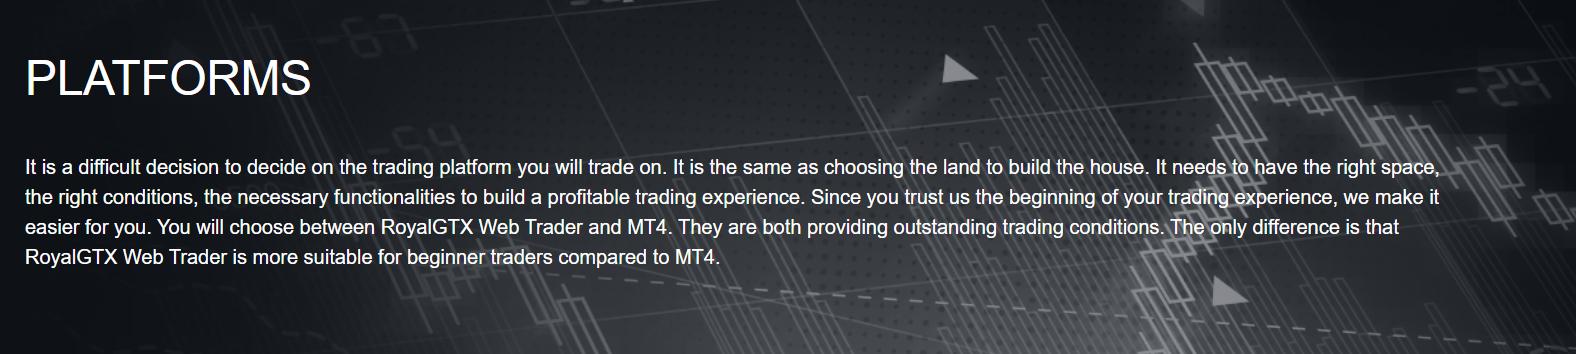 Royal GTX Platforms